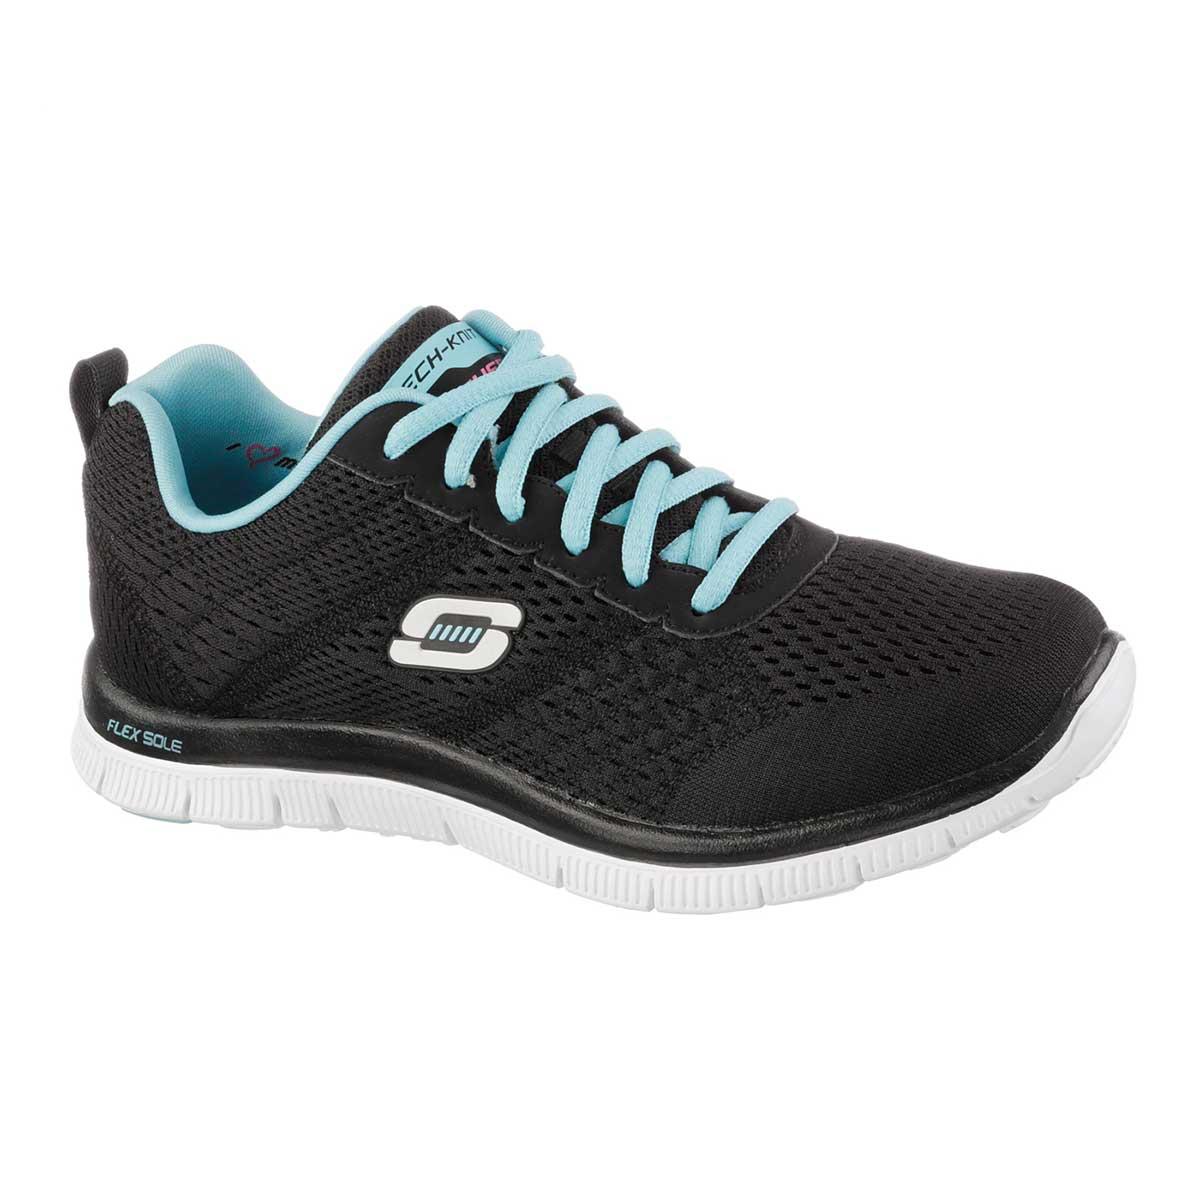 Buy Skechers Flex Appeal Womens Running